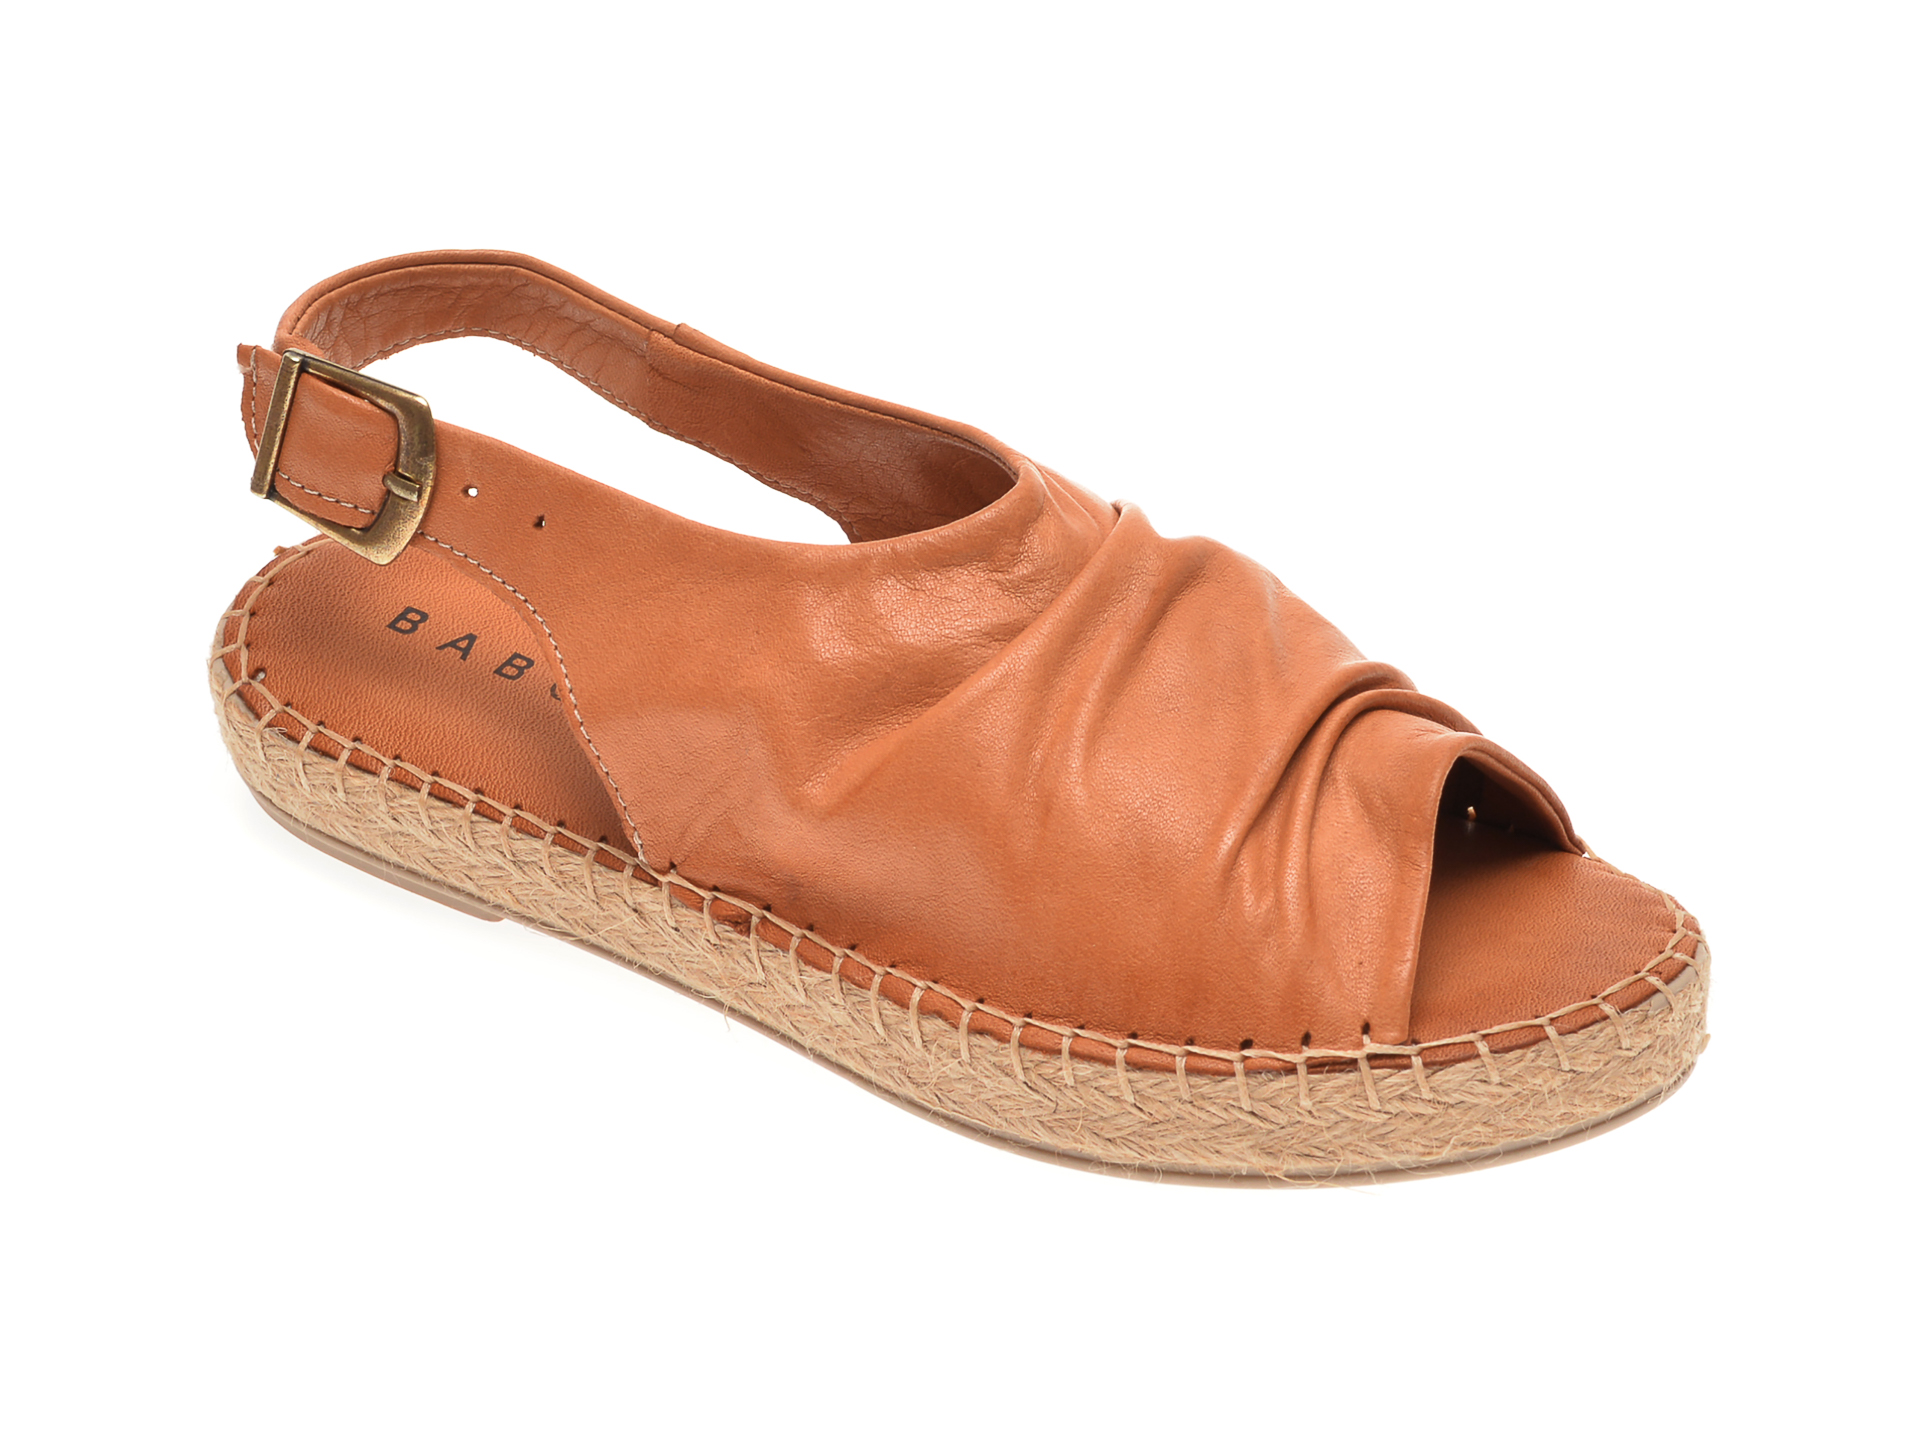 Sandale BABOOS maro, R06, din piele naturala